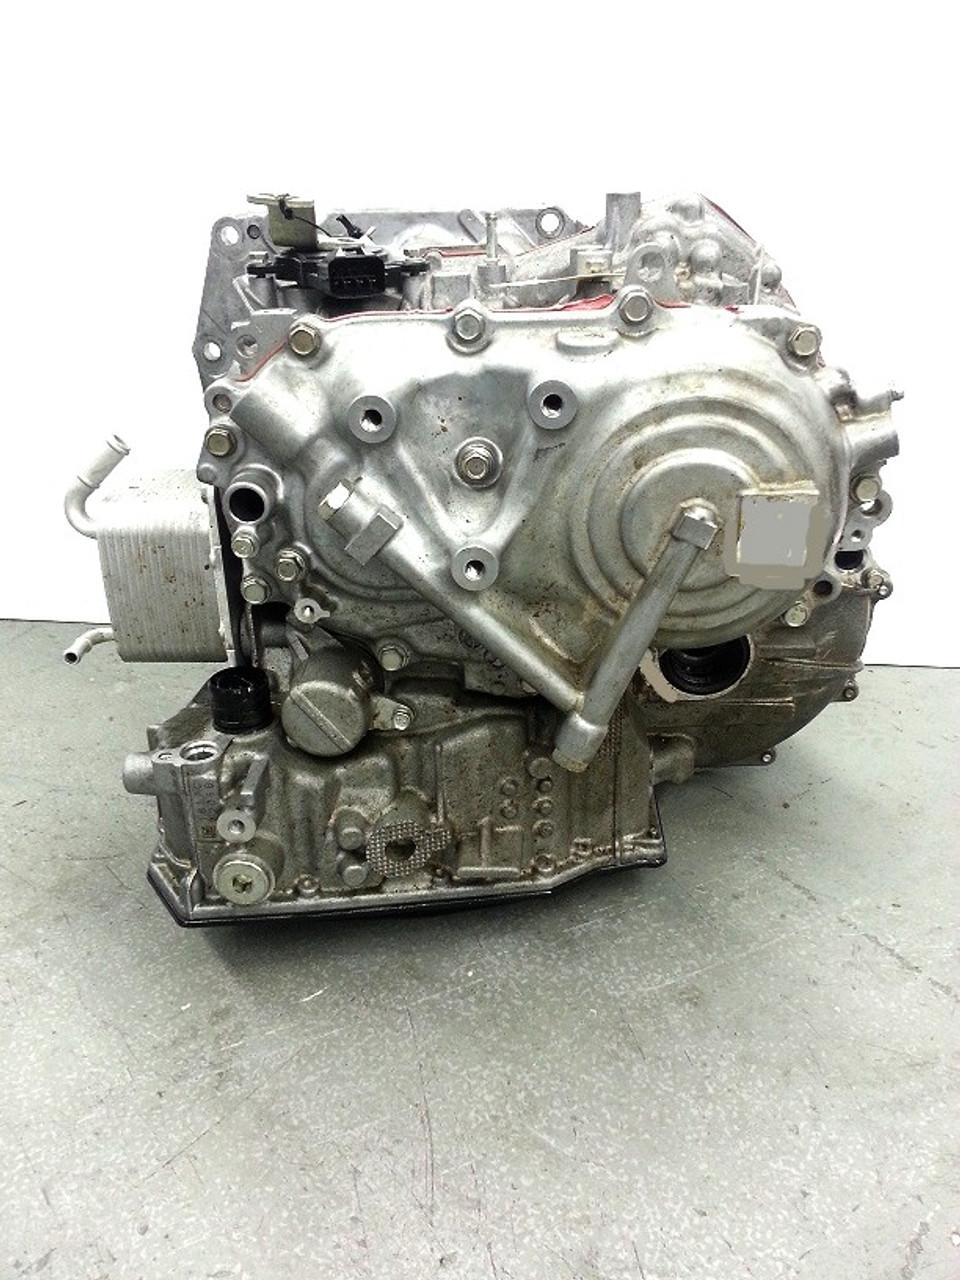 JF015 CVT Transmission Nissan Juke   (REOF011)